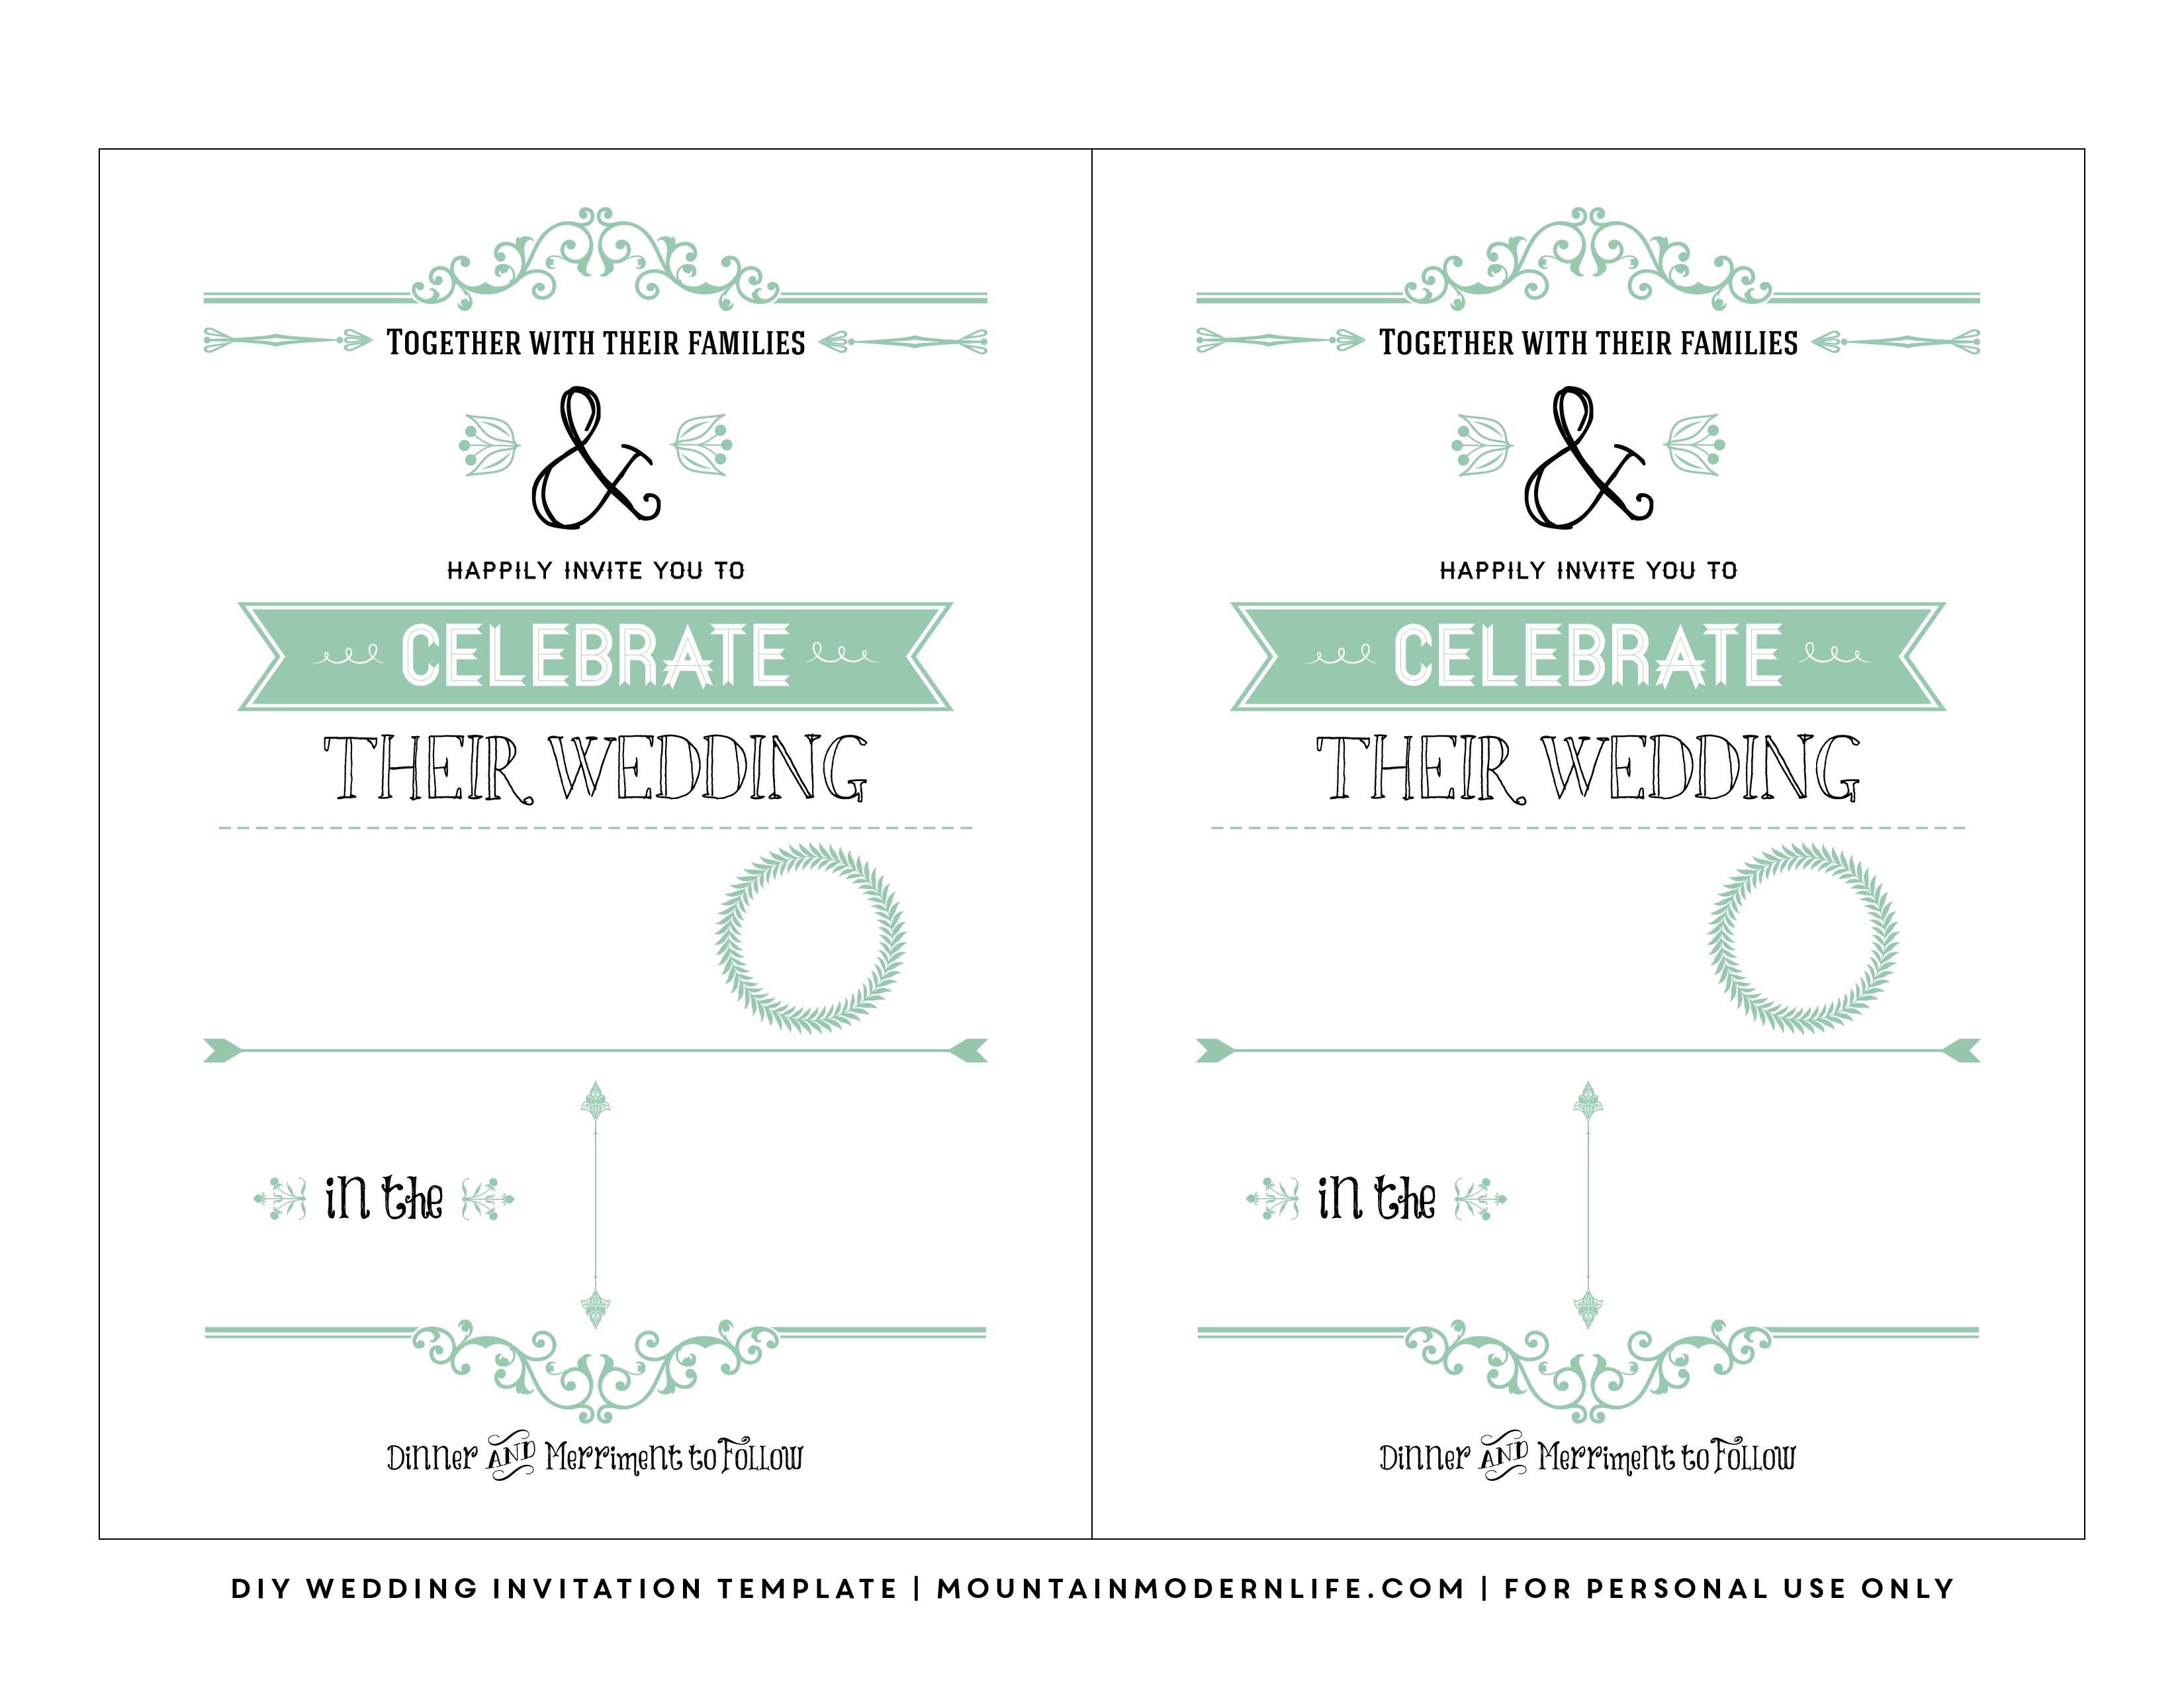 Free Wedding Invitation Template   Mountainmodernlife - Free Printable Invitations Templates